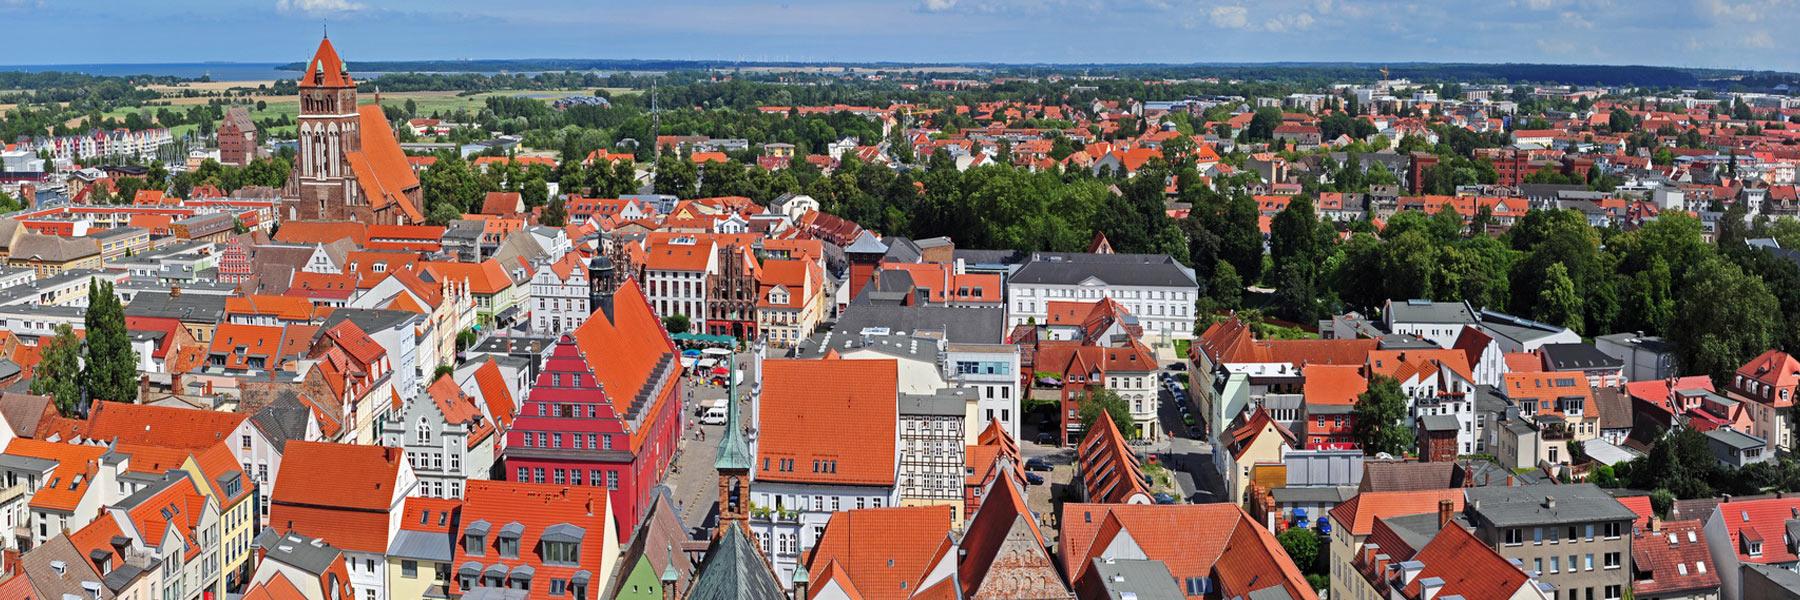 Luftaufnahme - Hansestadt Greifswald